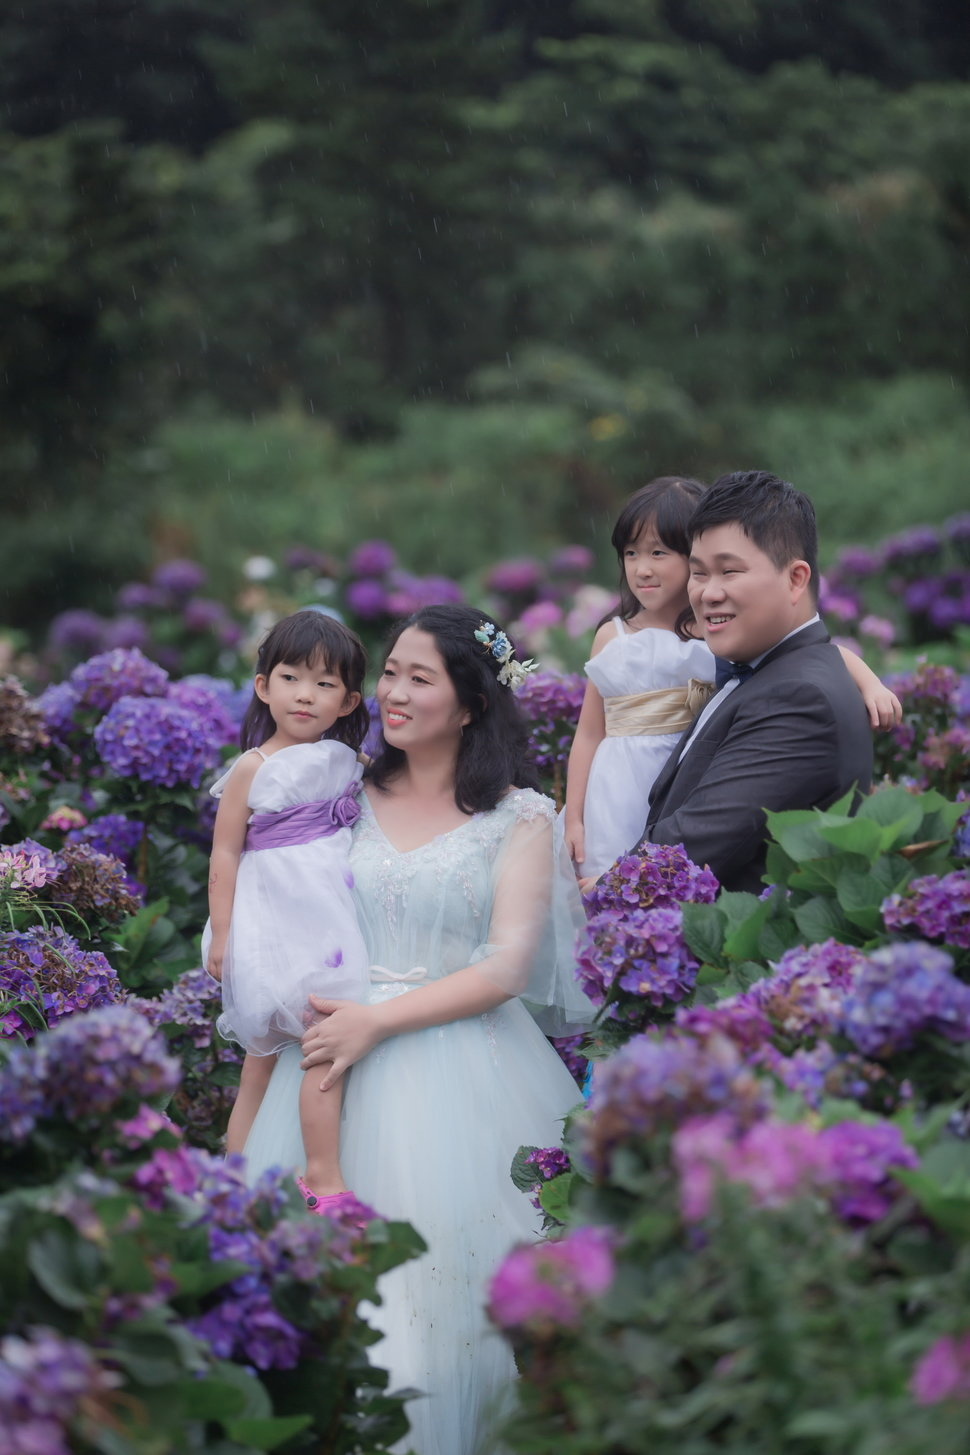 PP_0045_調整大小 - 巴黎婚紗攝影台灣總店《結婚吧》